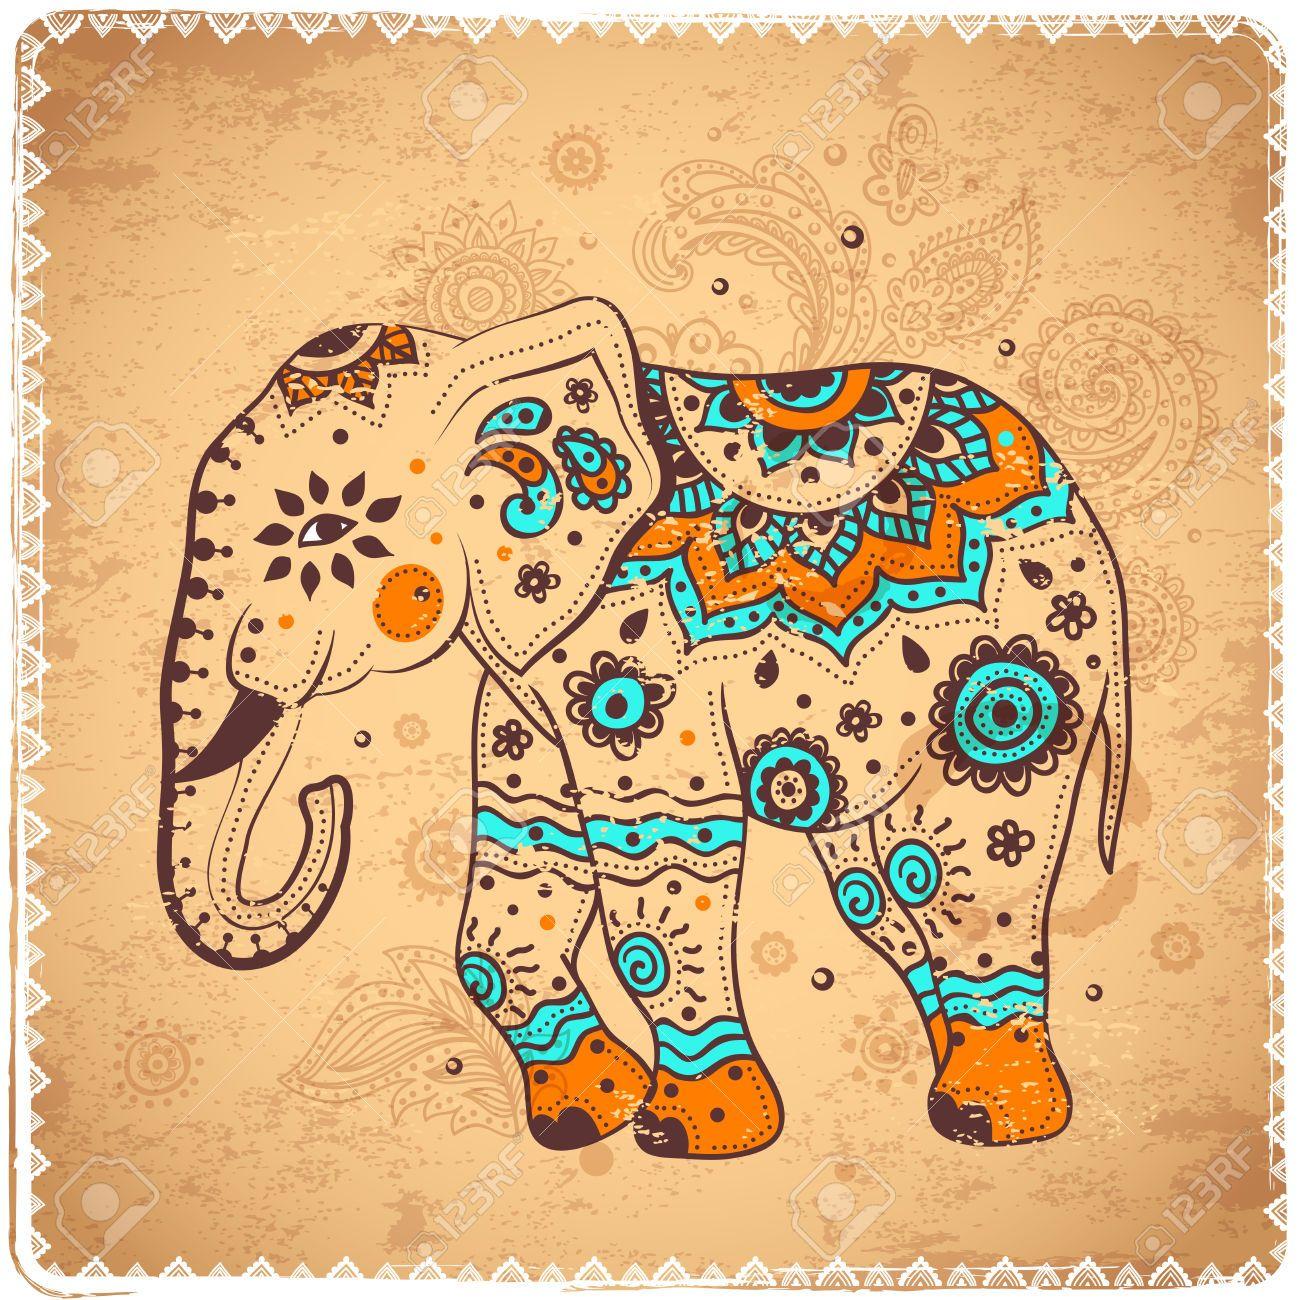 Elefante Indio Dibujo Buscar Con Google Elefantes Pintados Elefante Indio Elefantes Bordados